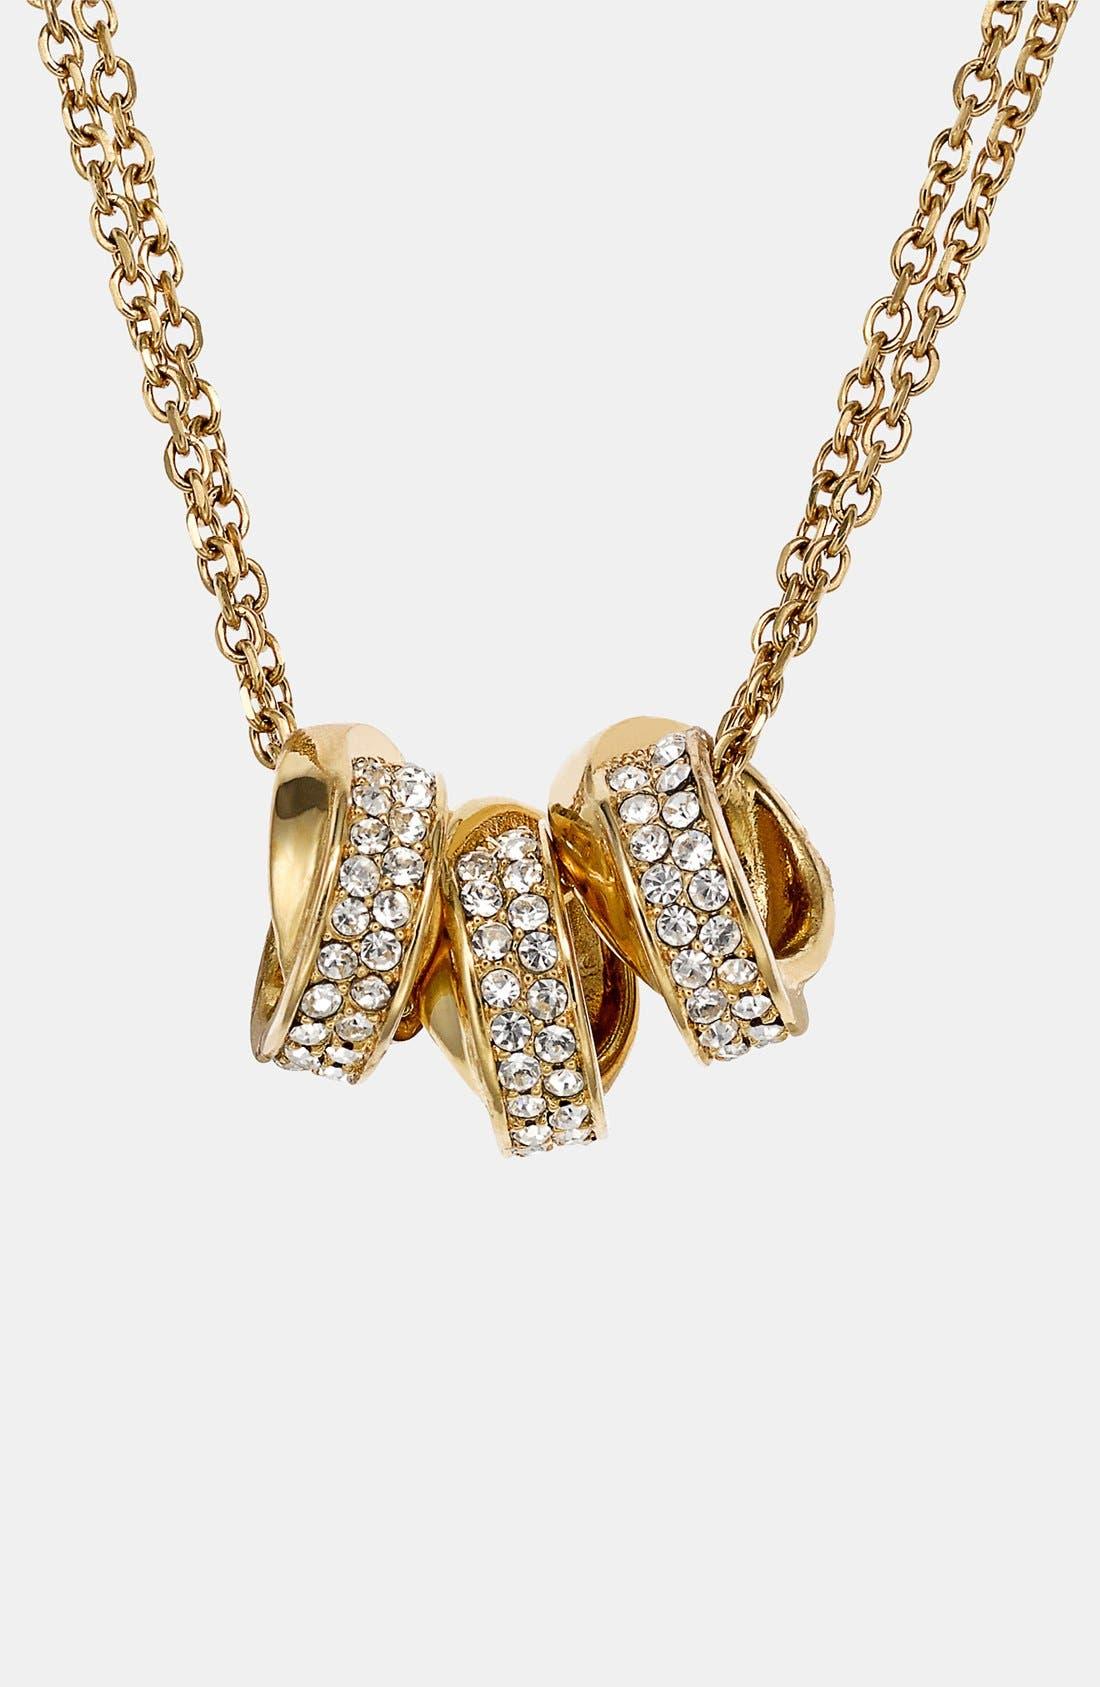 Main Image - Michael Kors 'Brilliance' Double Chain Necklace